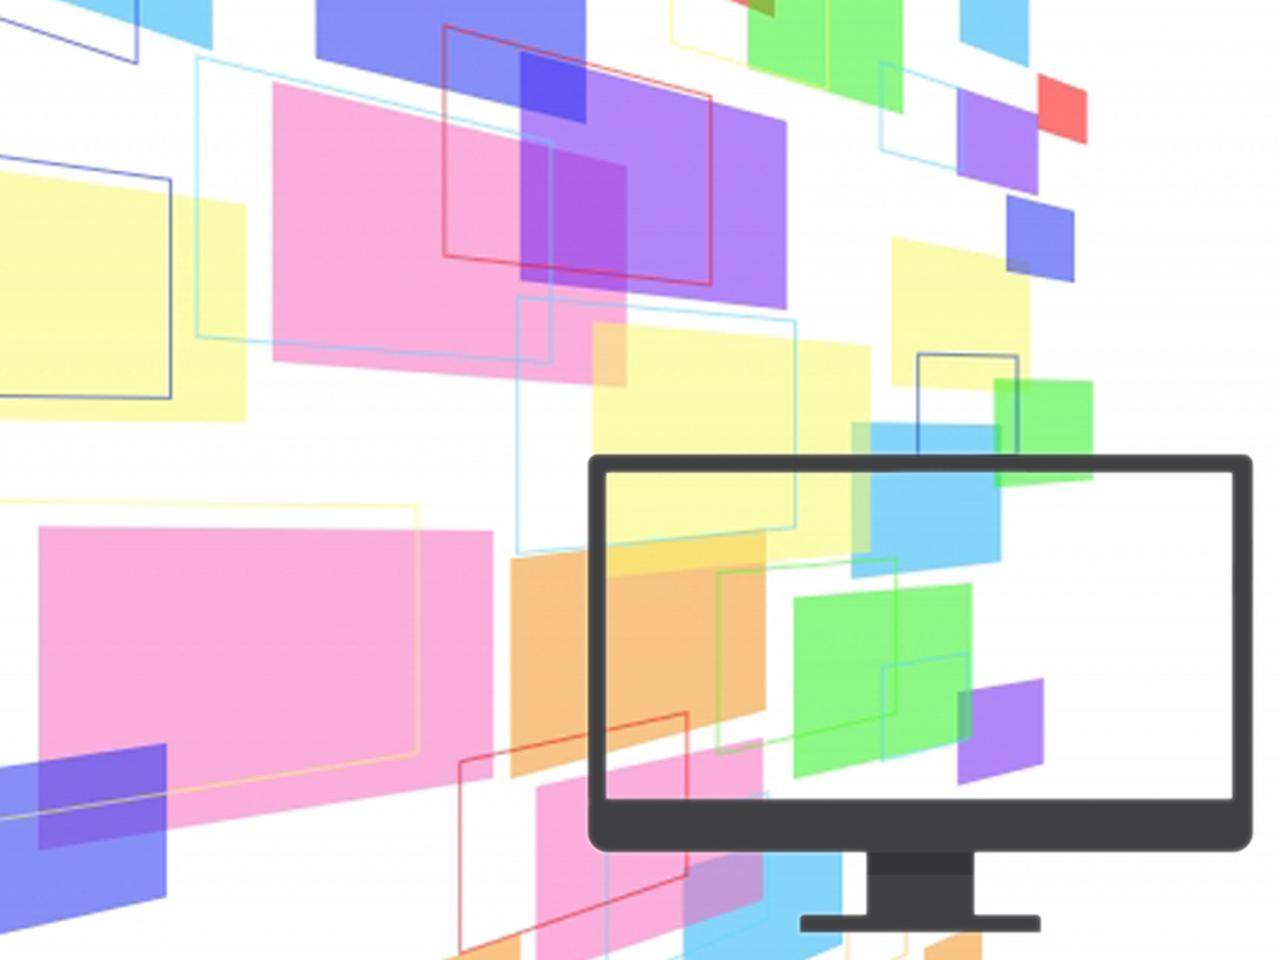 Windows10 壁紙や画面のカラーを変更する方法 テーマ の変更が